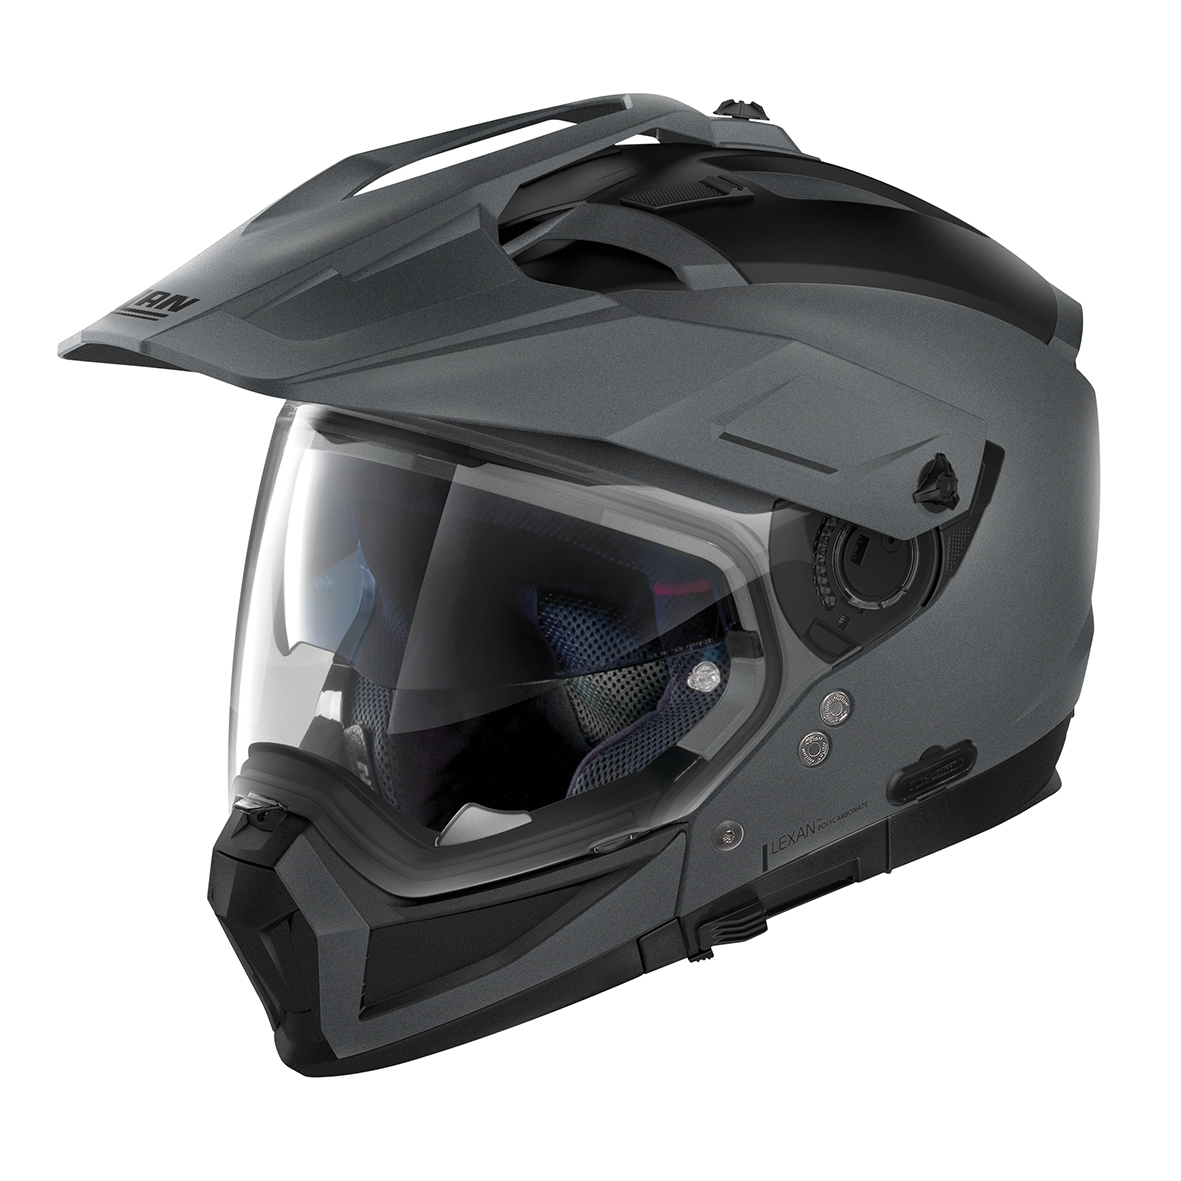 Moto helma Nolan N70-2 X Classic N-Com Flat Vulcan Grey 2